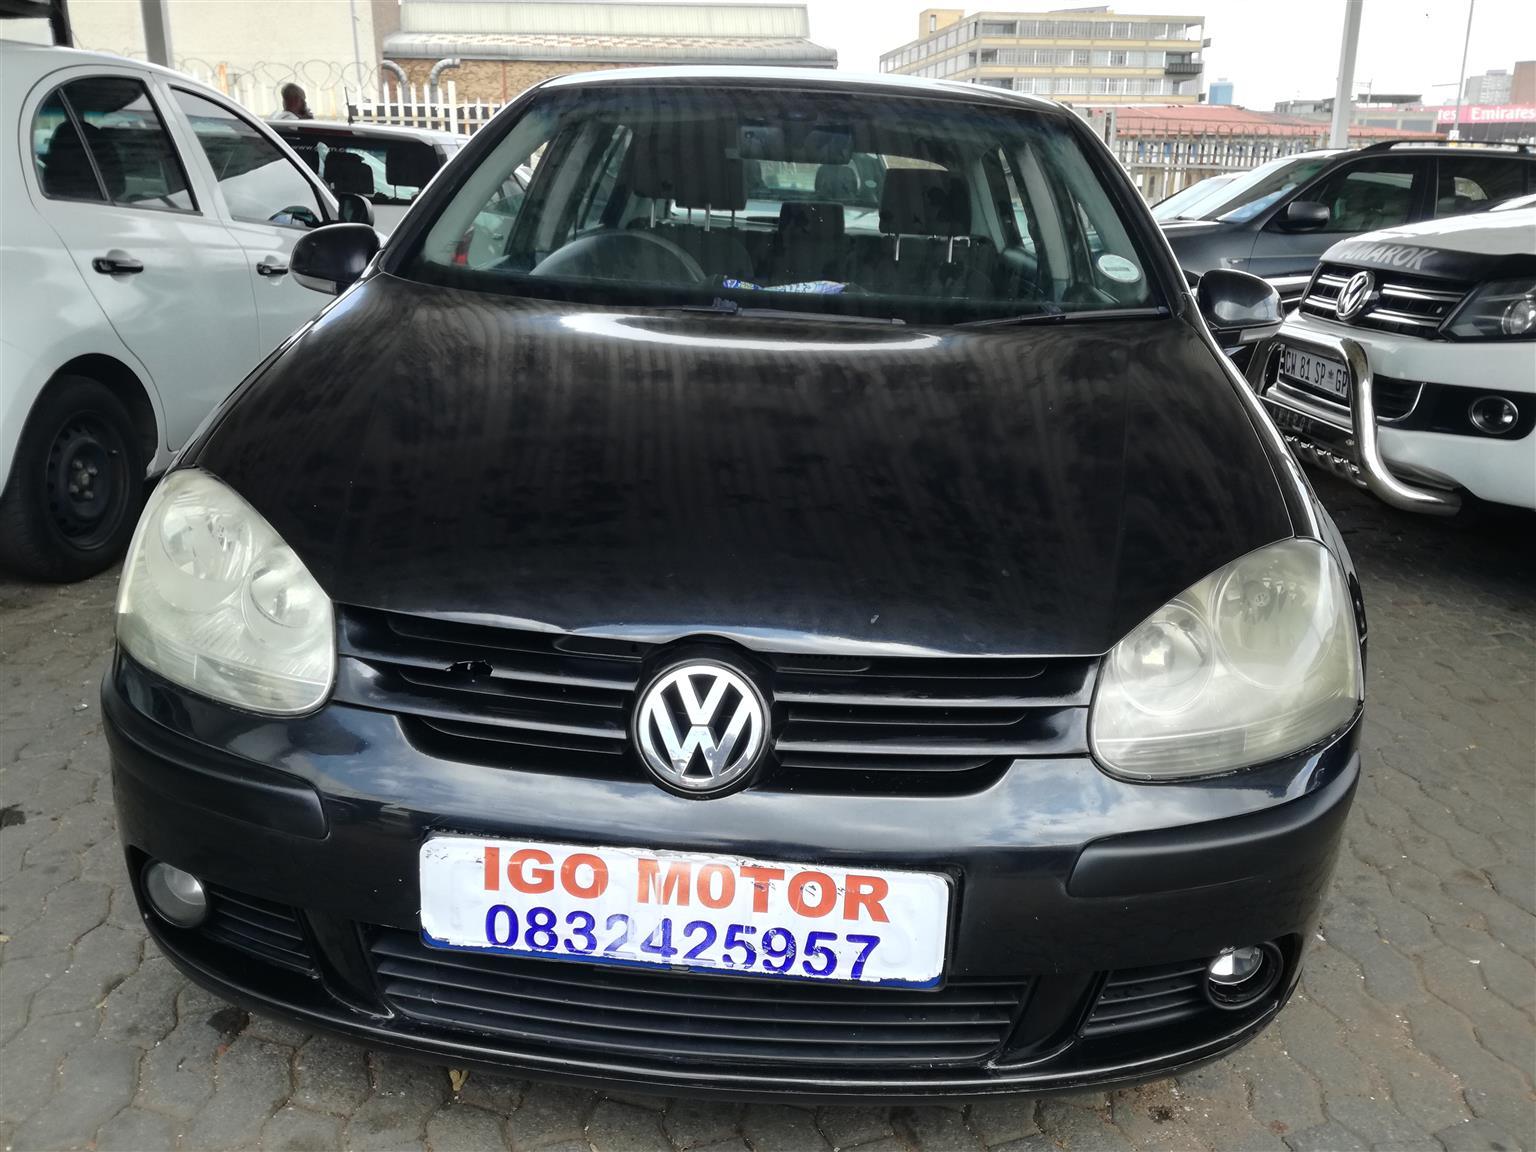 2006 VW Golf 1.6 Trendline